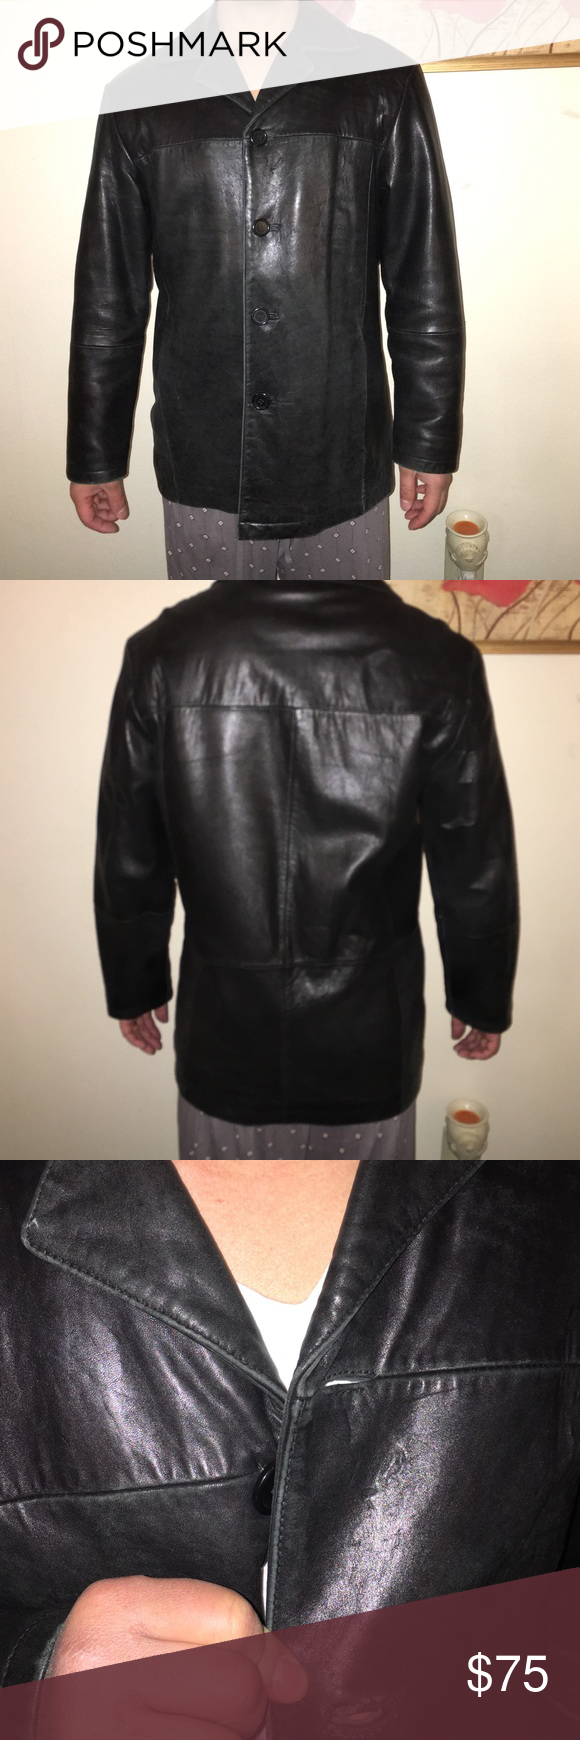 Wilson suede coat size Large ( vintage) Great vintage